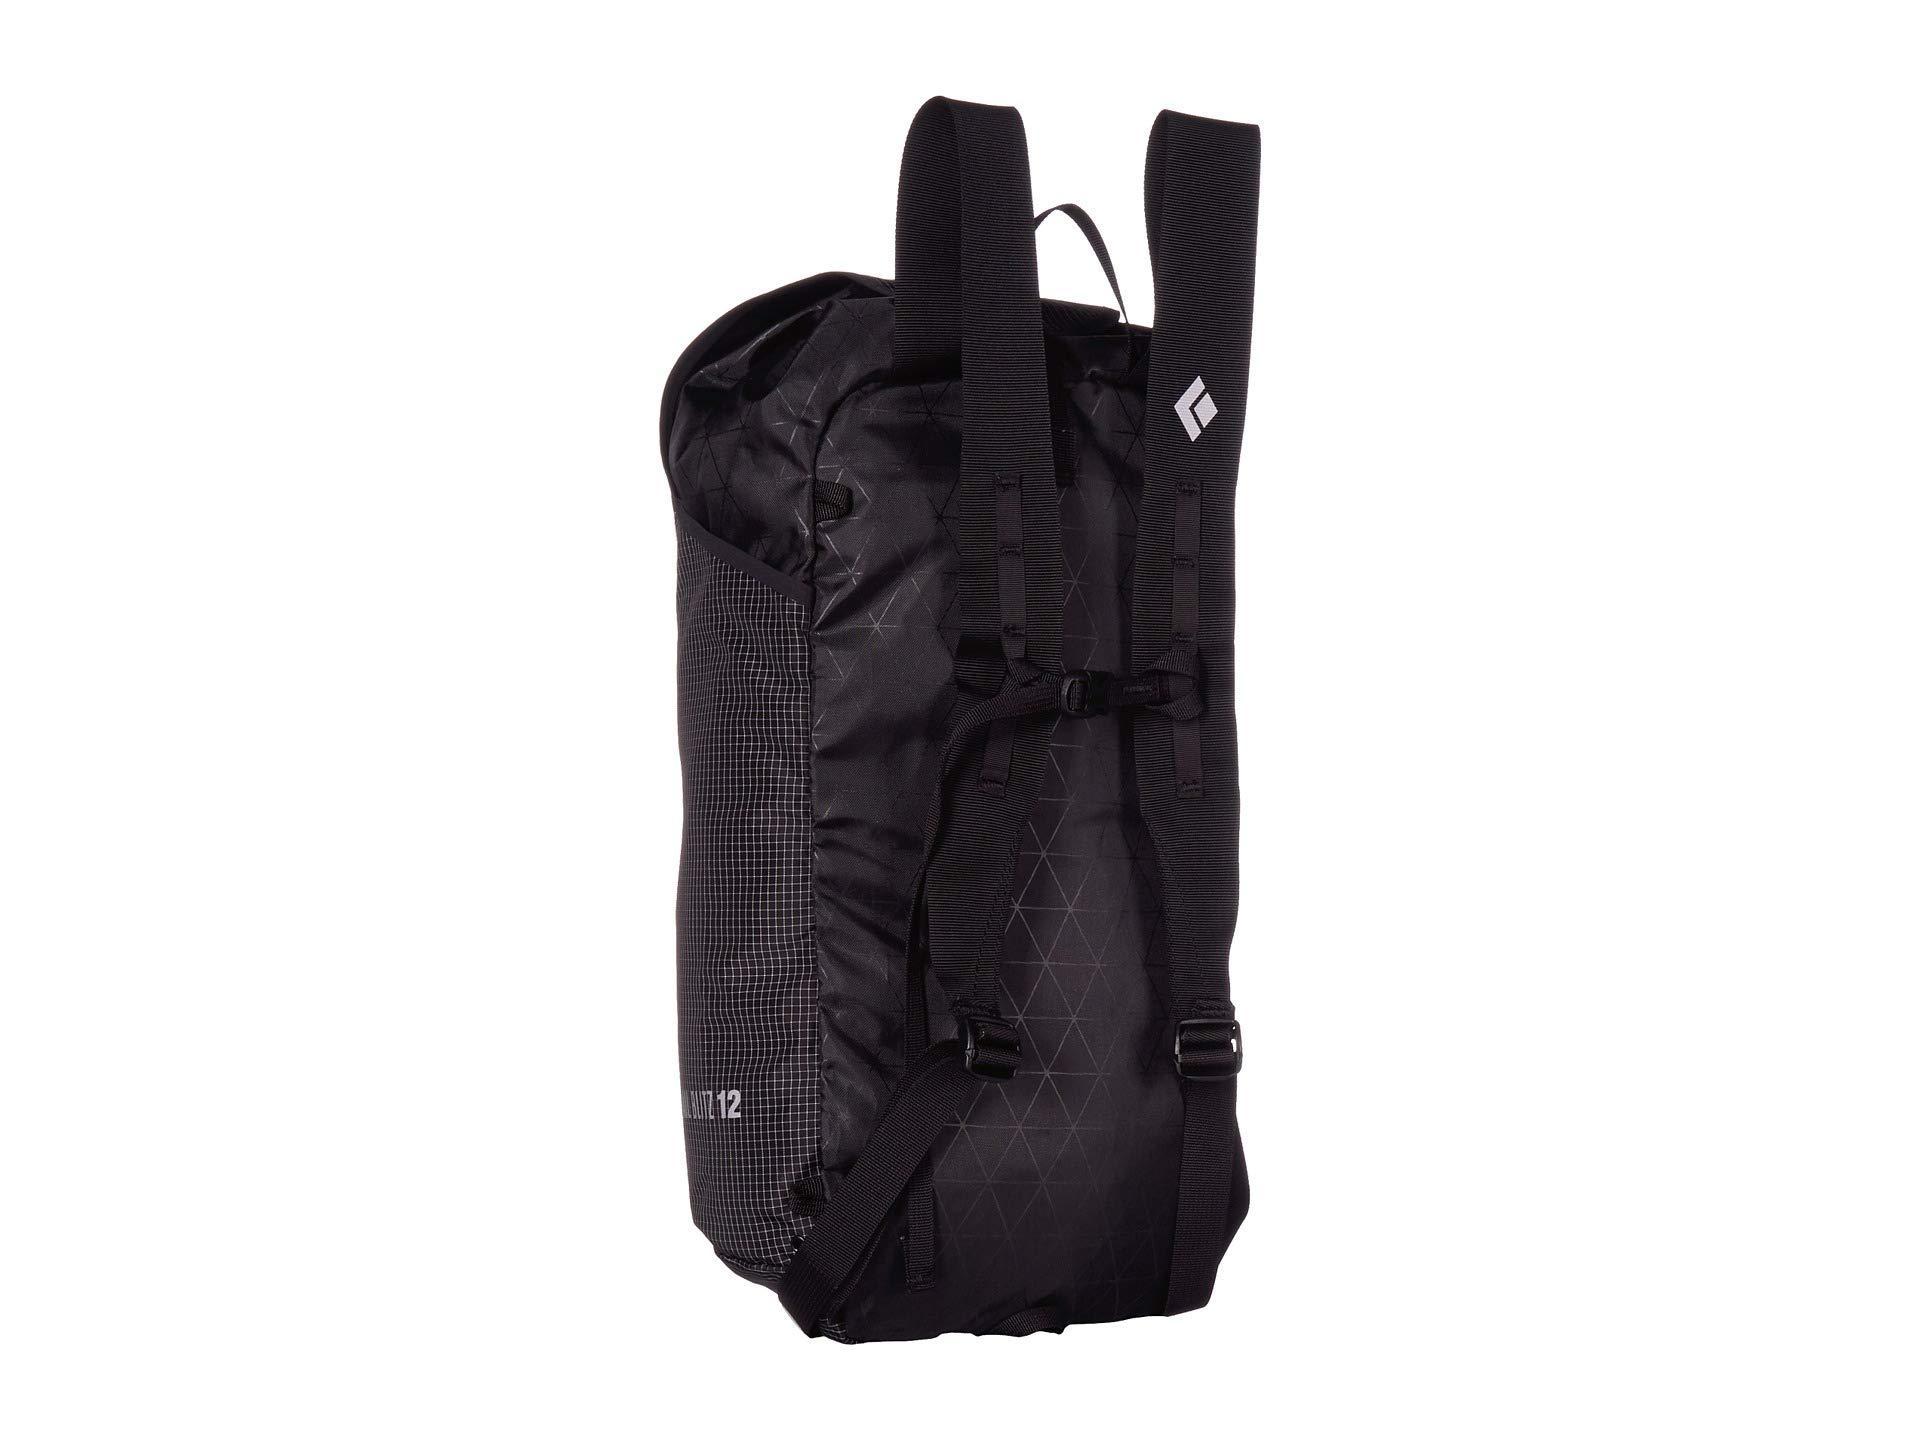 25479dba343 Women's Black Trail Blitz 12 Backpack